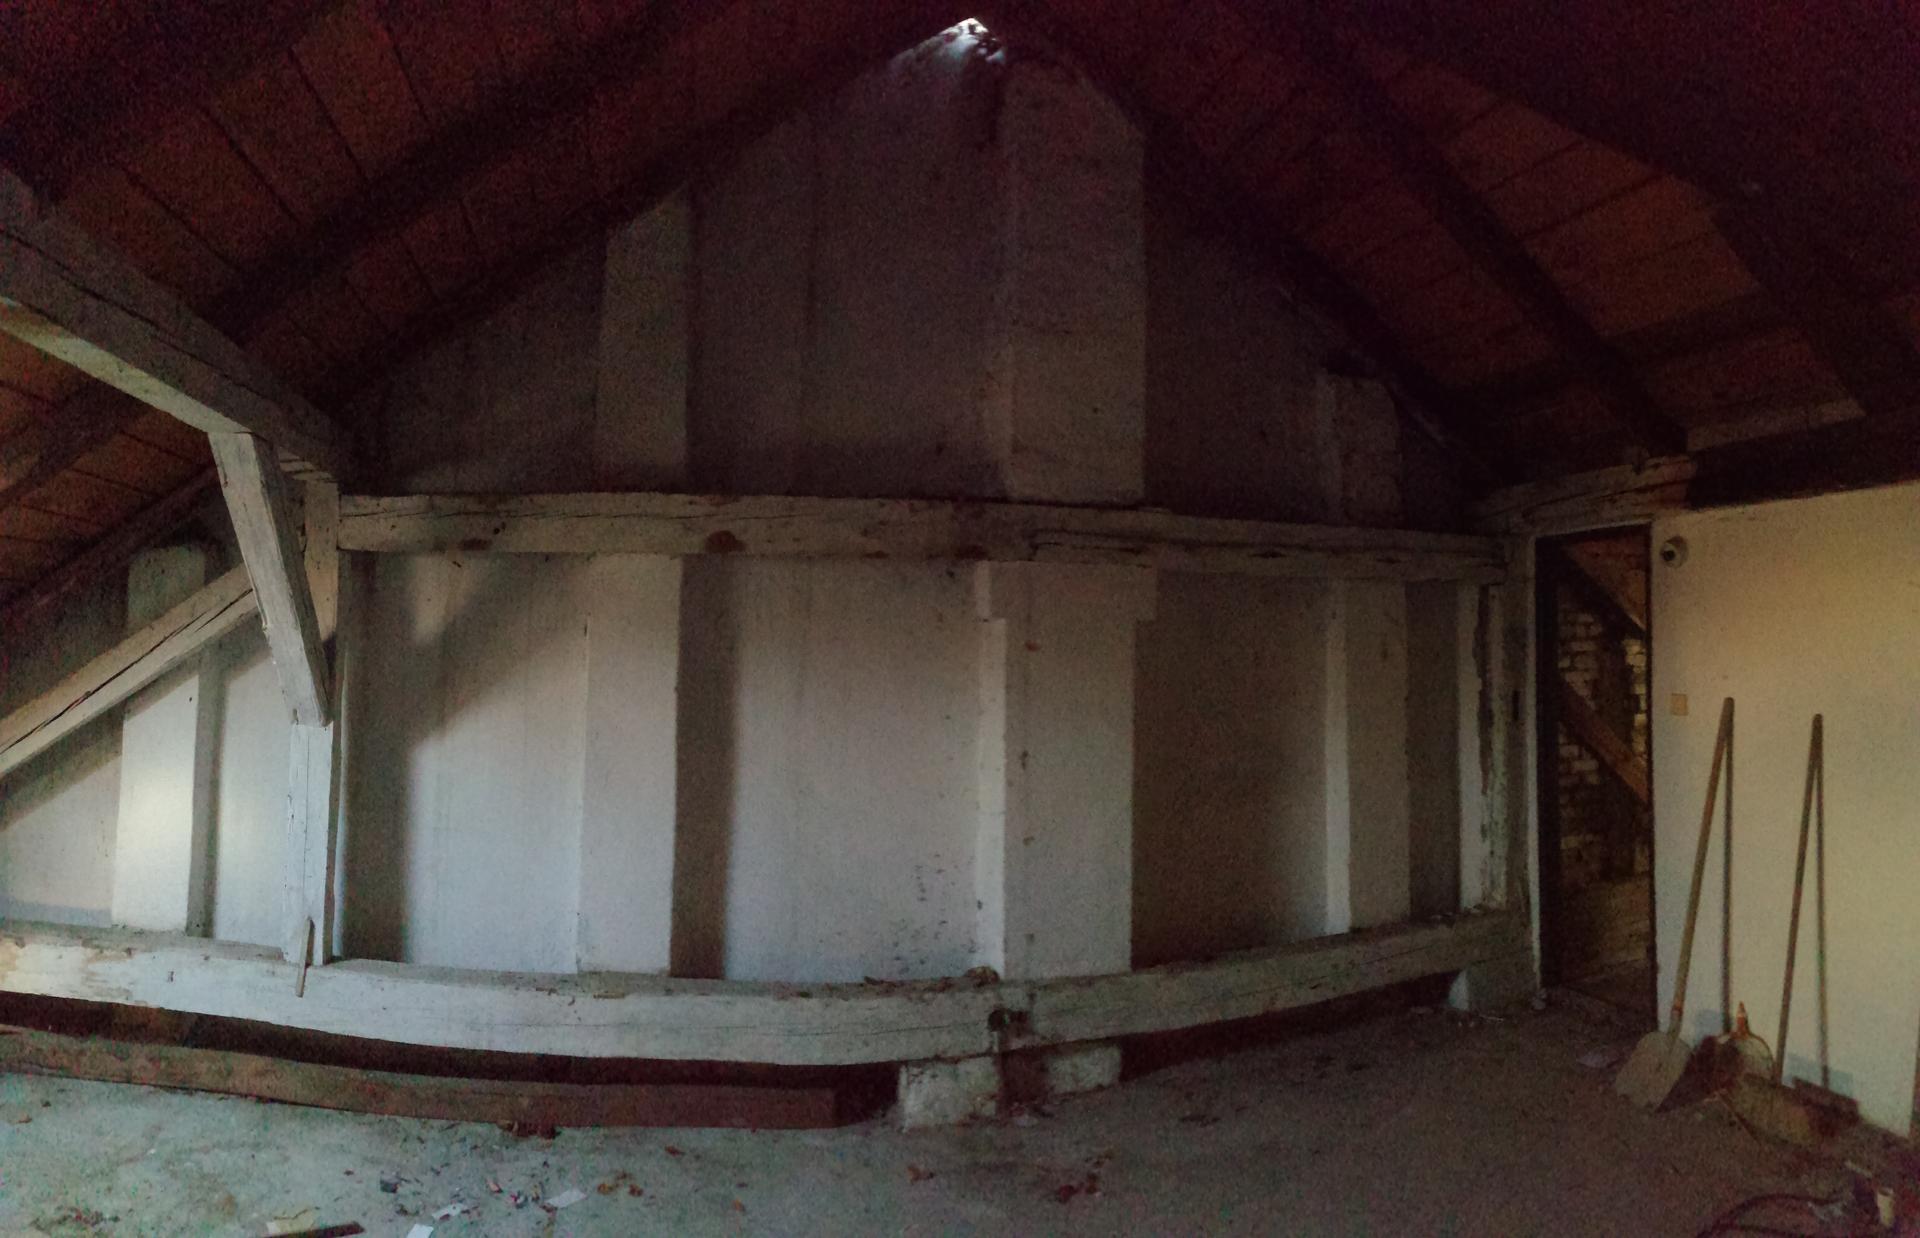 Prestavba podkrovia zo sedlovo valbovej na sedlovú strechu. - Obrázok č. 33